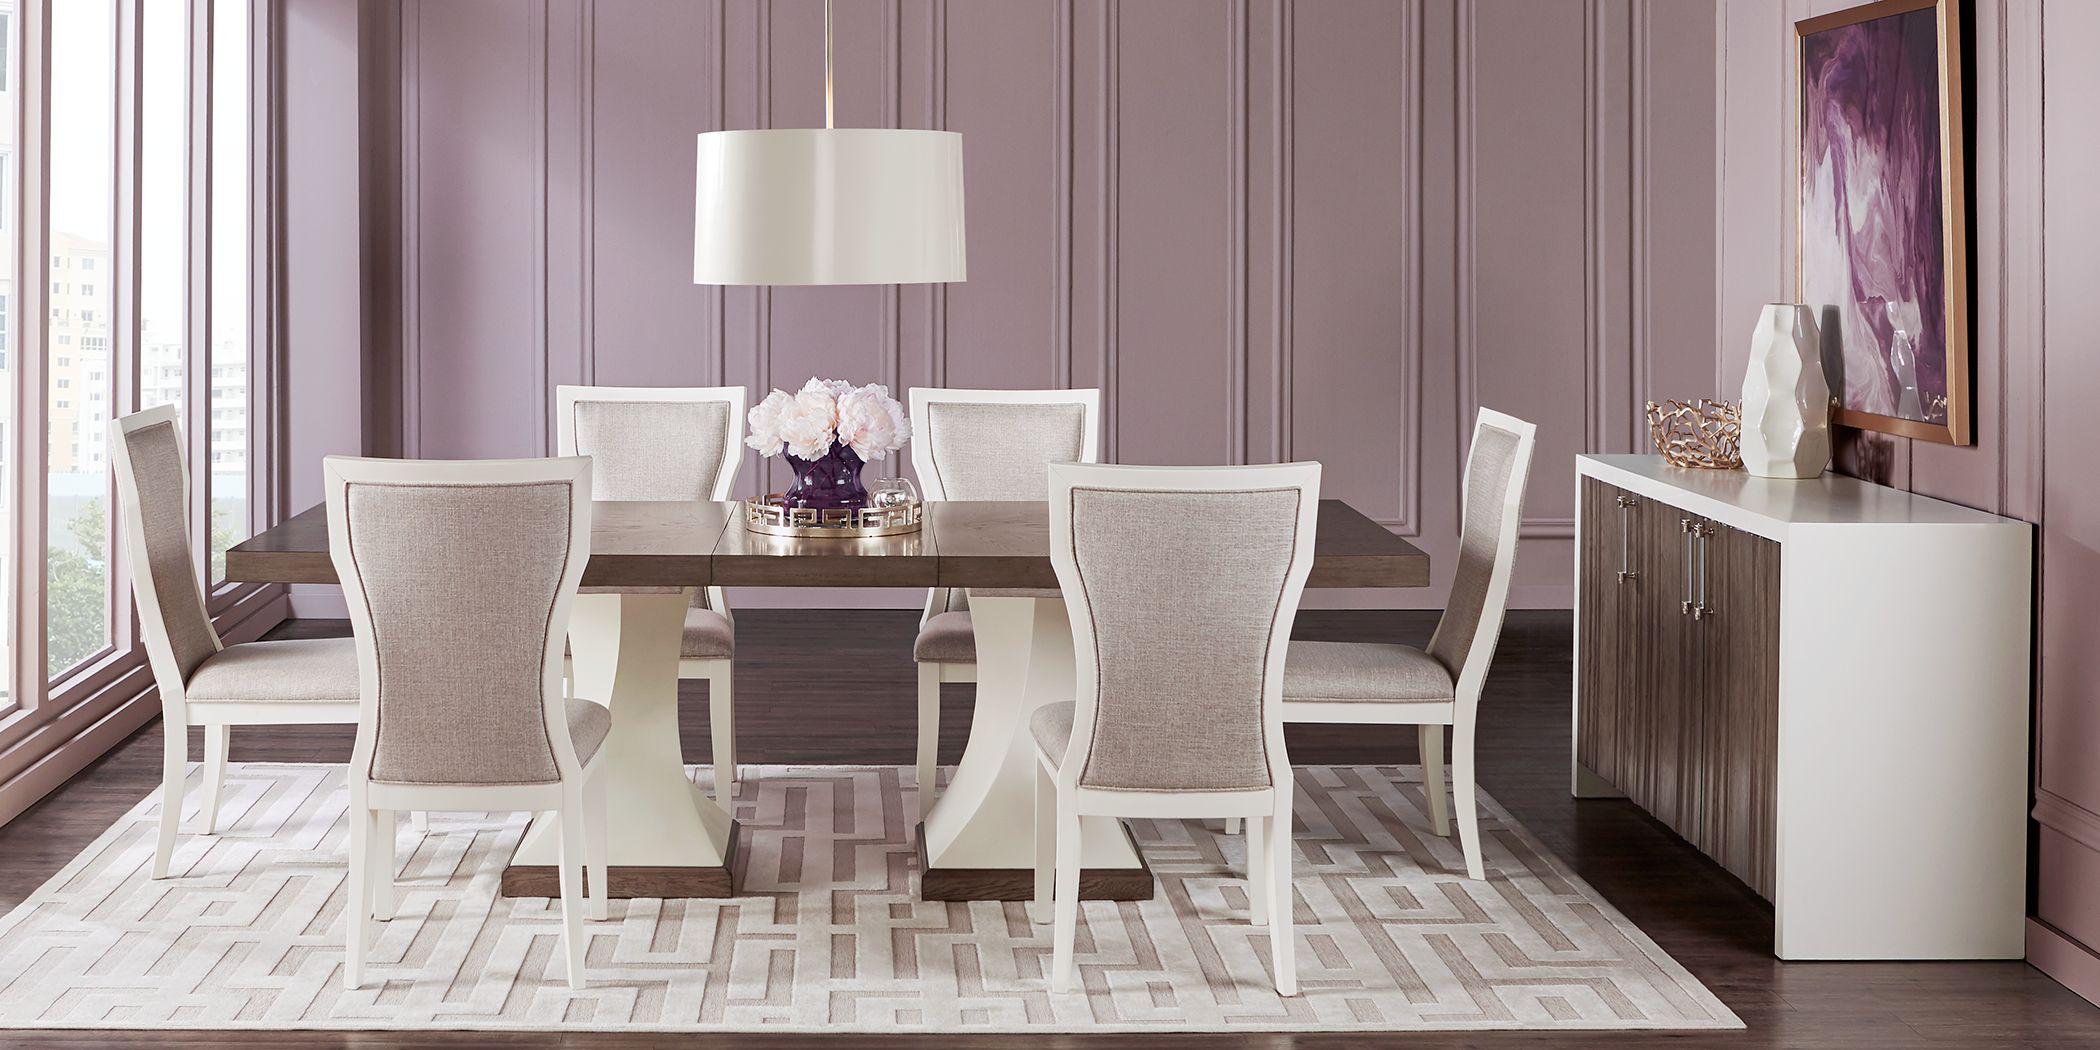 Sofia Vergara Santa Fiora White 5 Pc Rectangle Dining Room